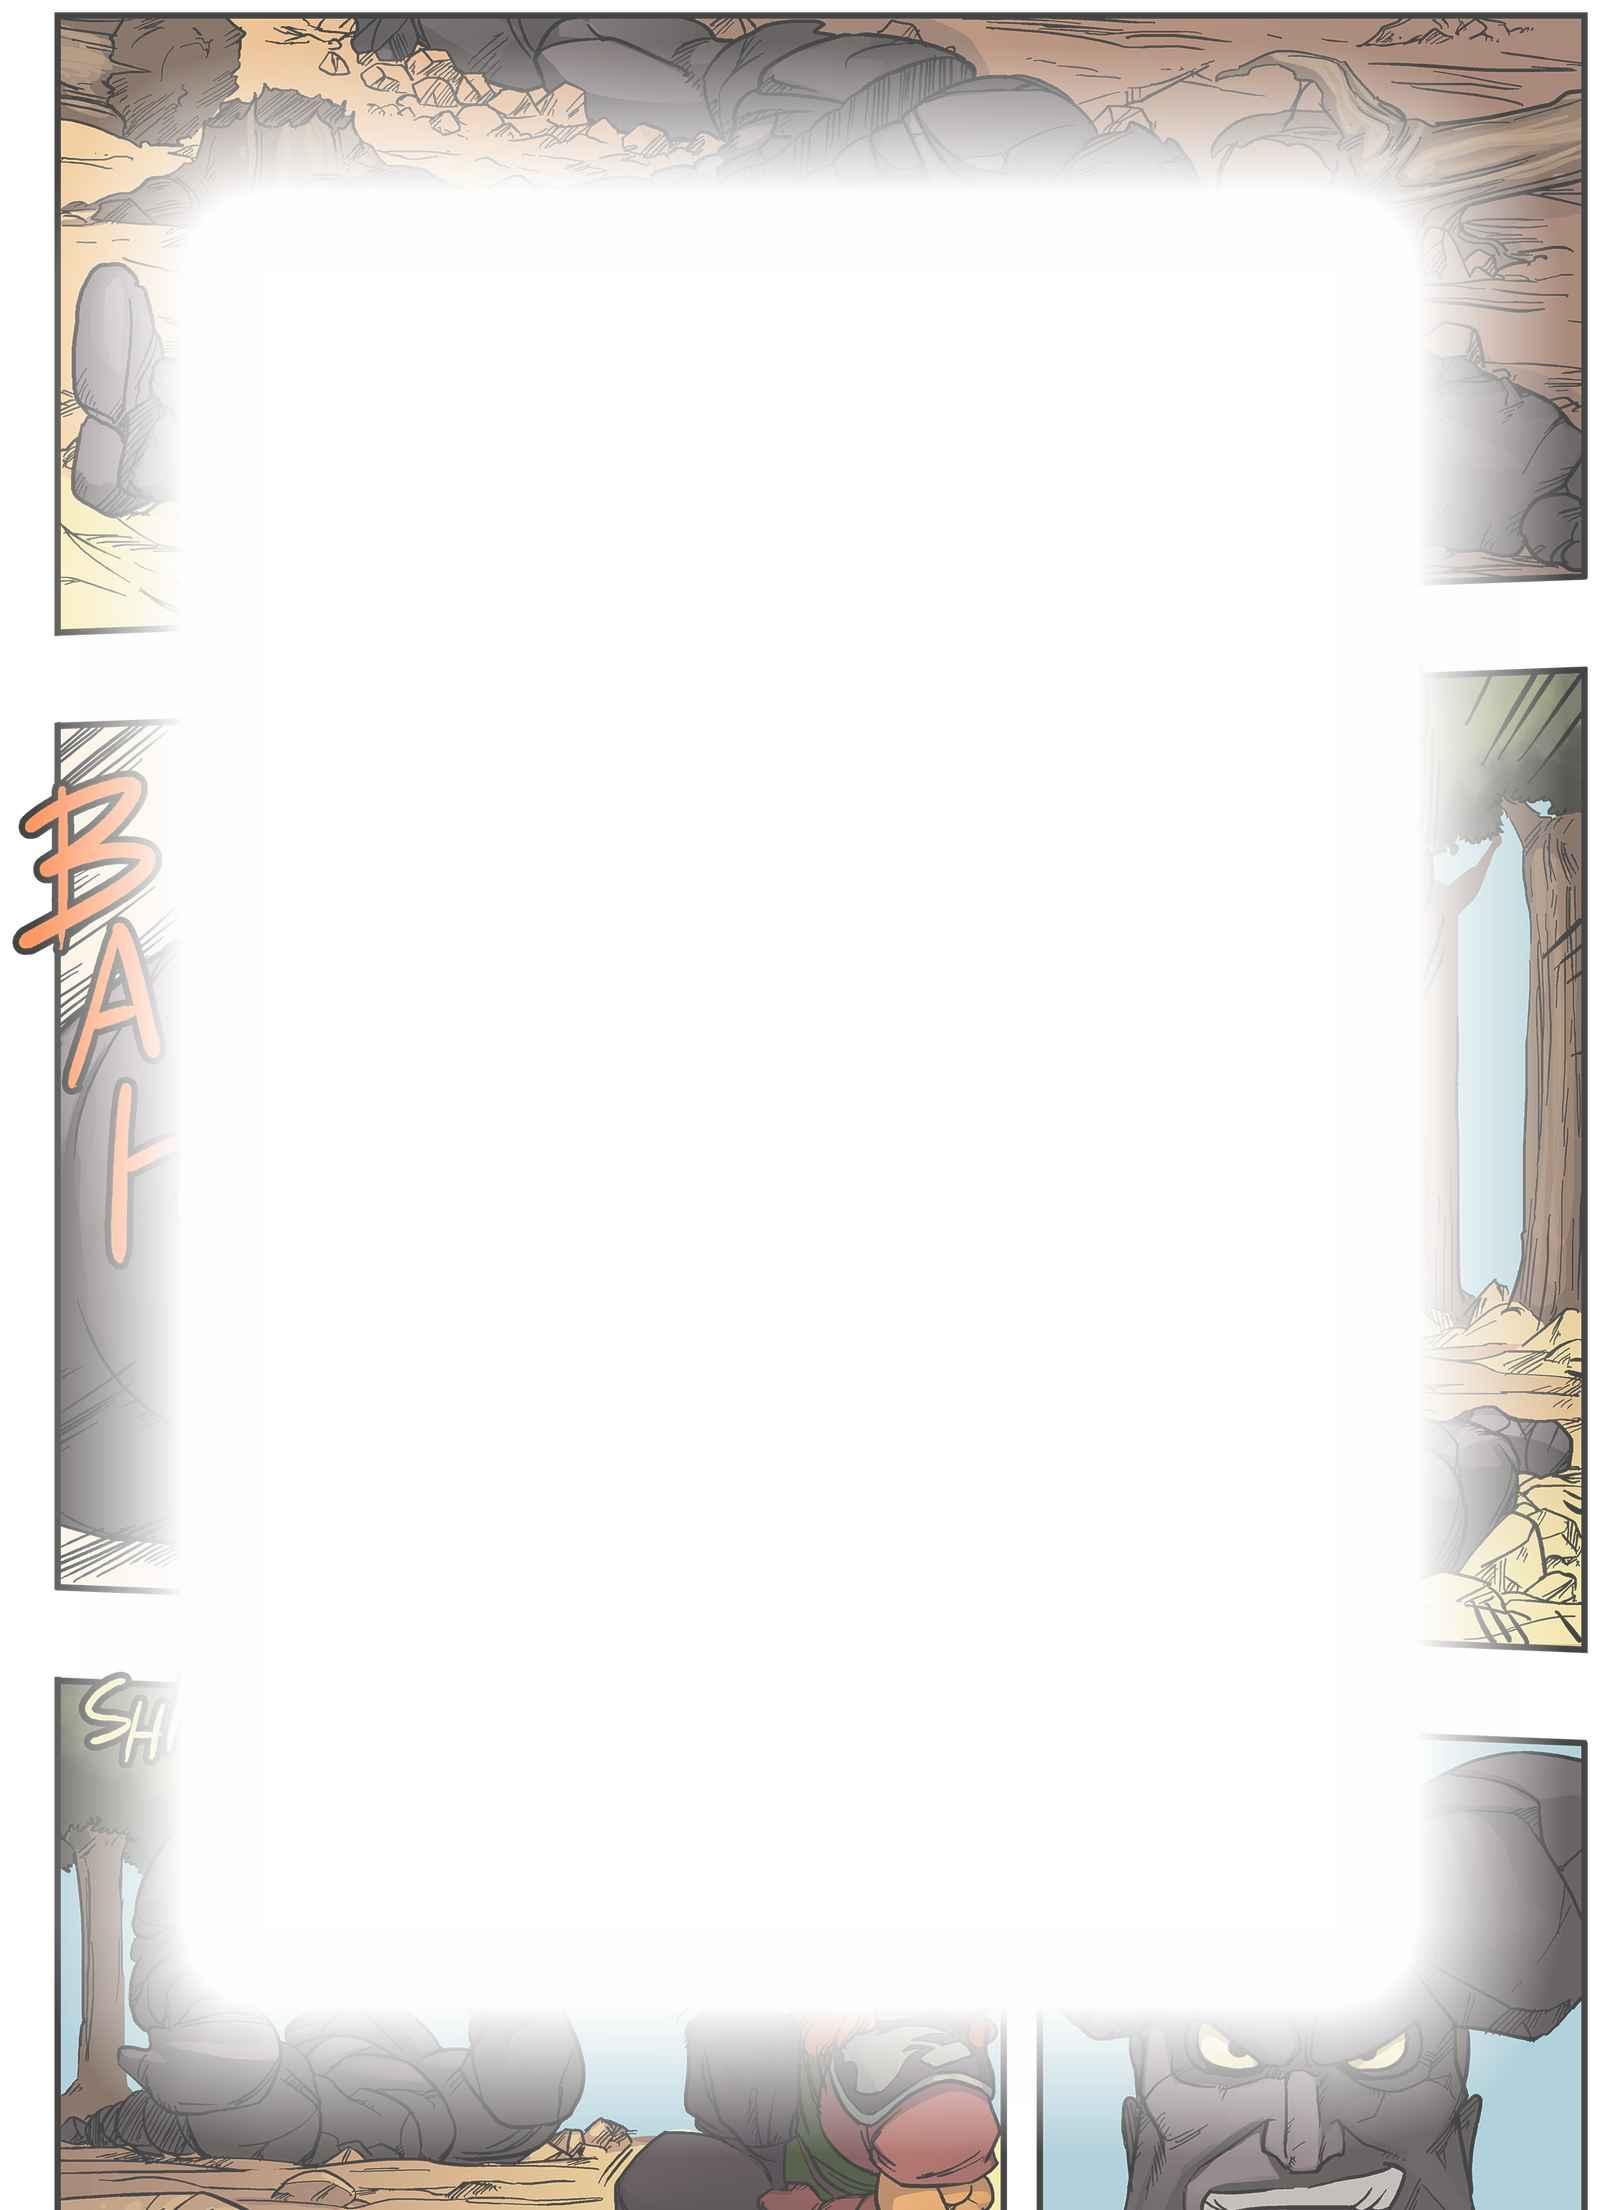 Hemispheres : チャプター 10 ページ 22